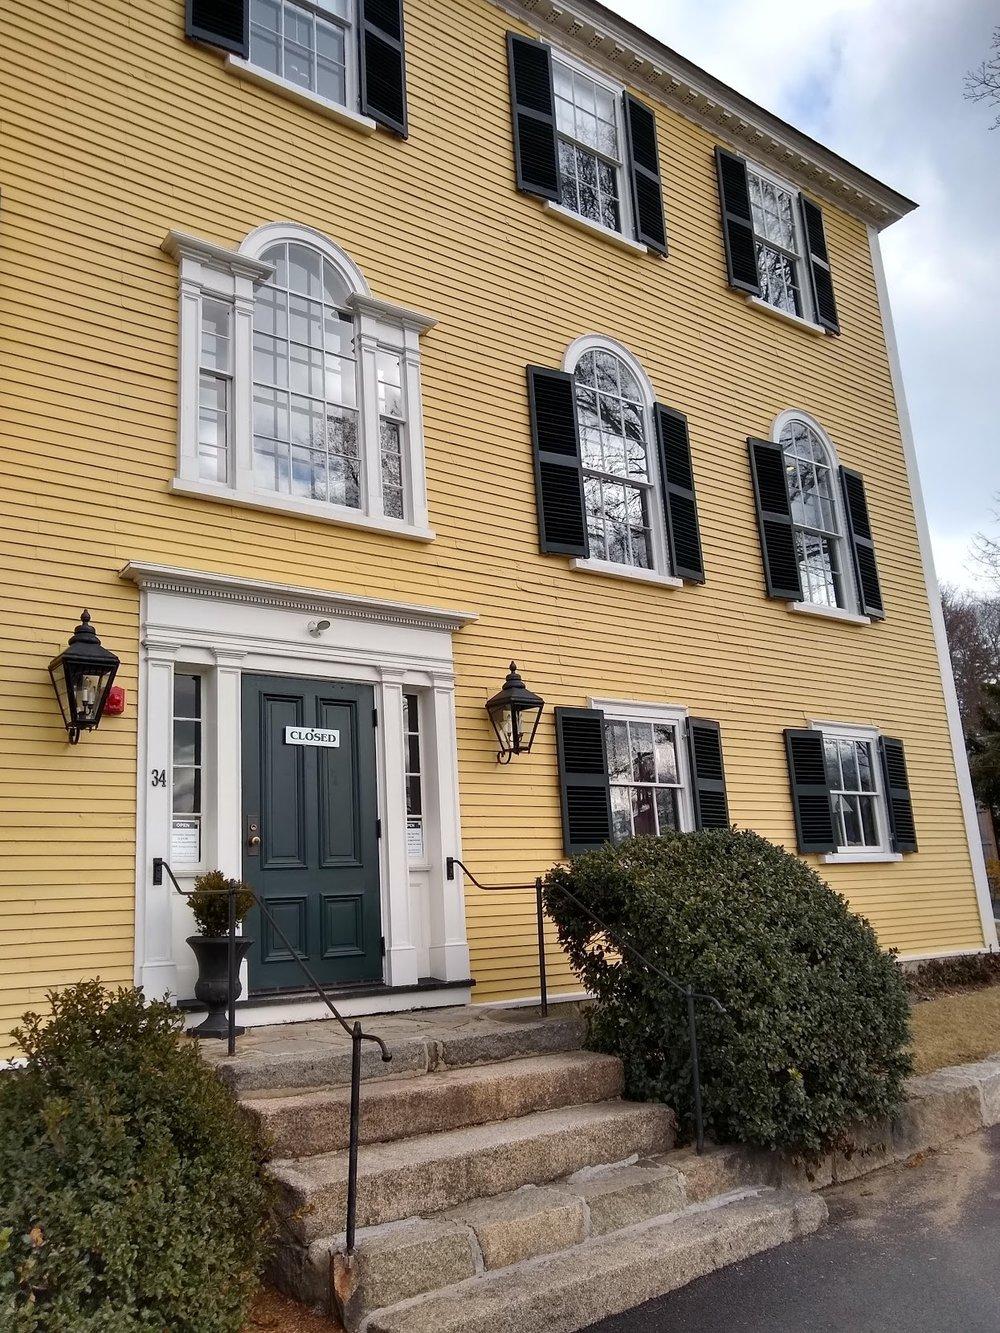 Historical Society building, Hingham, MA